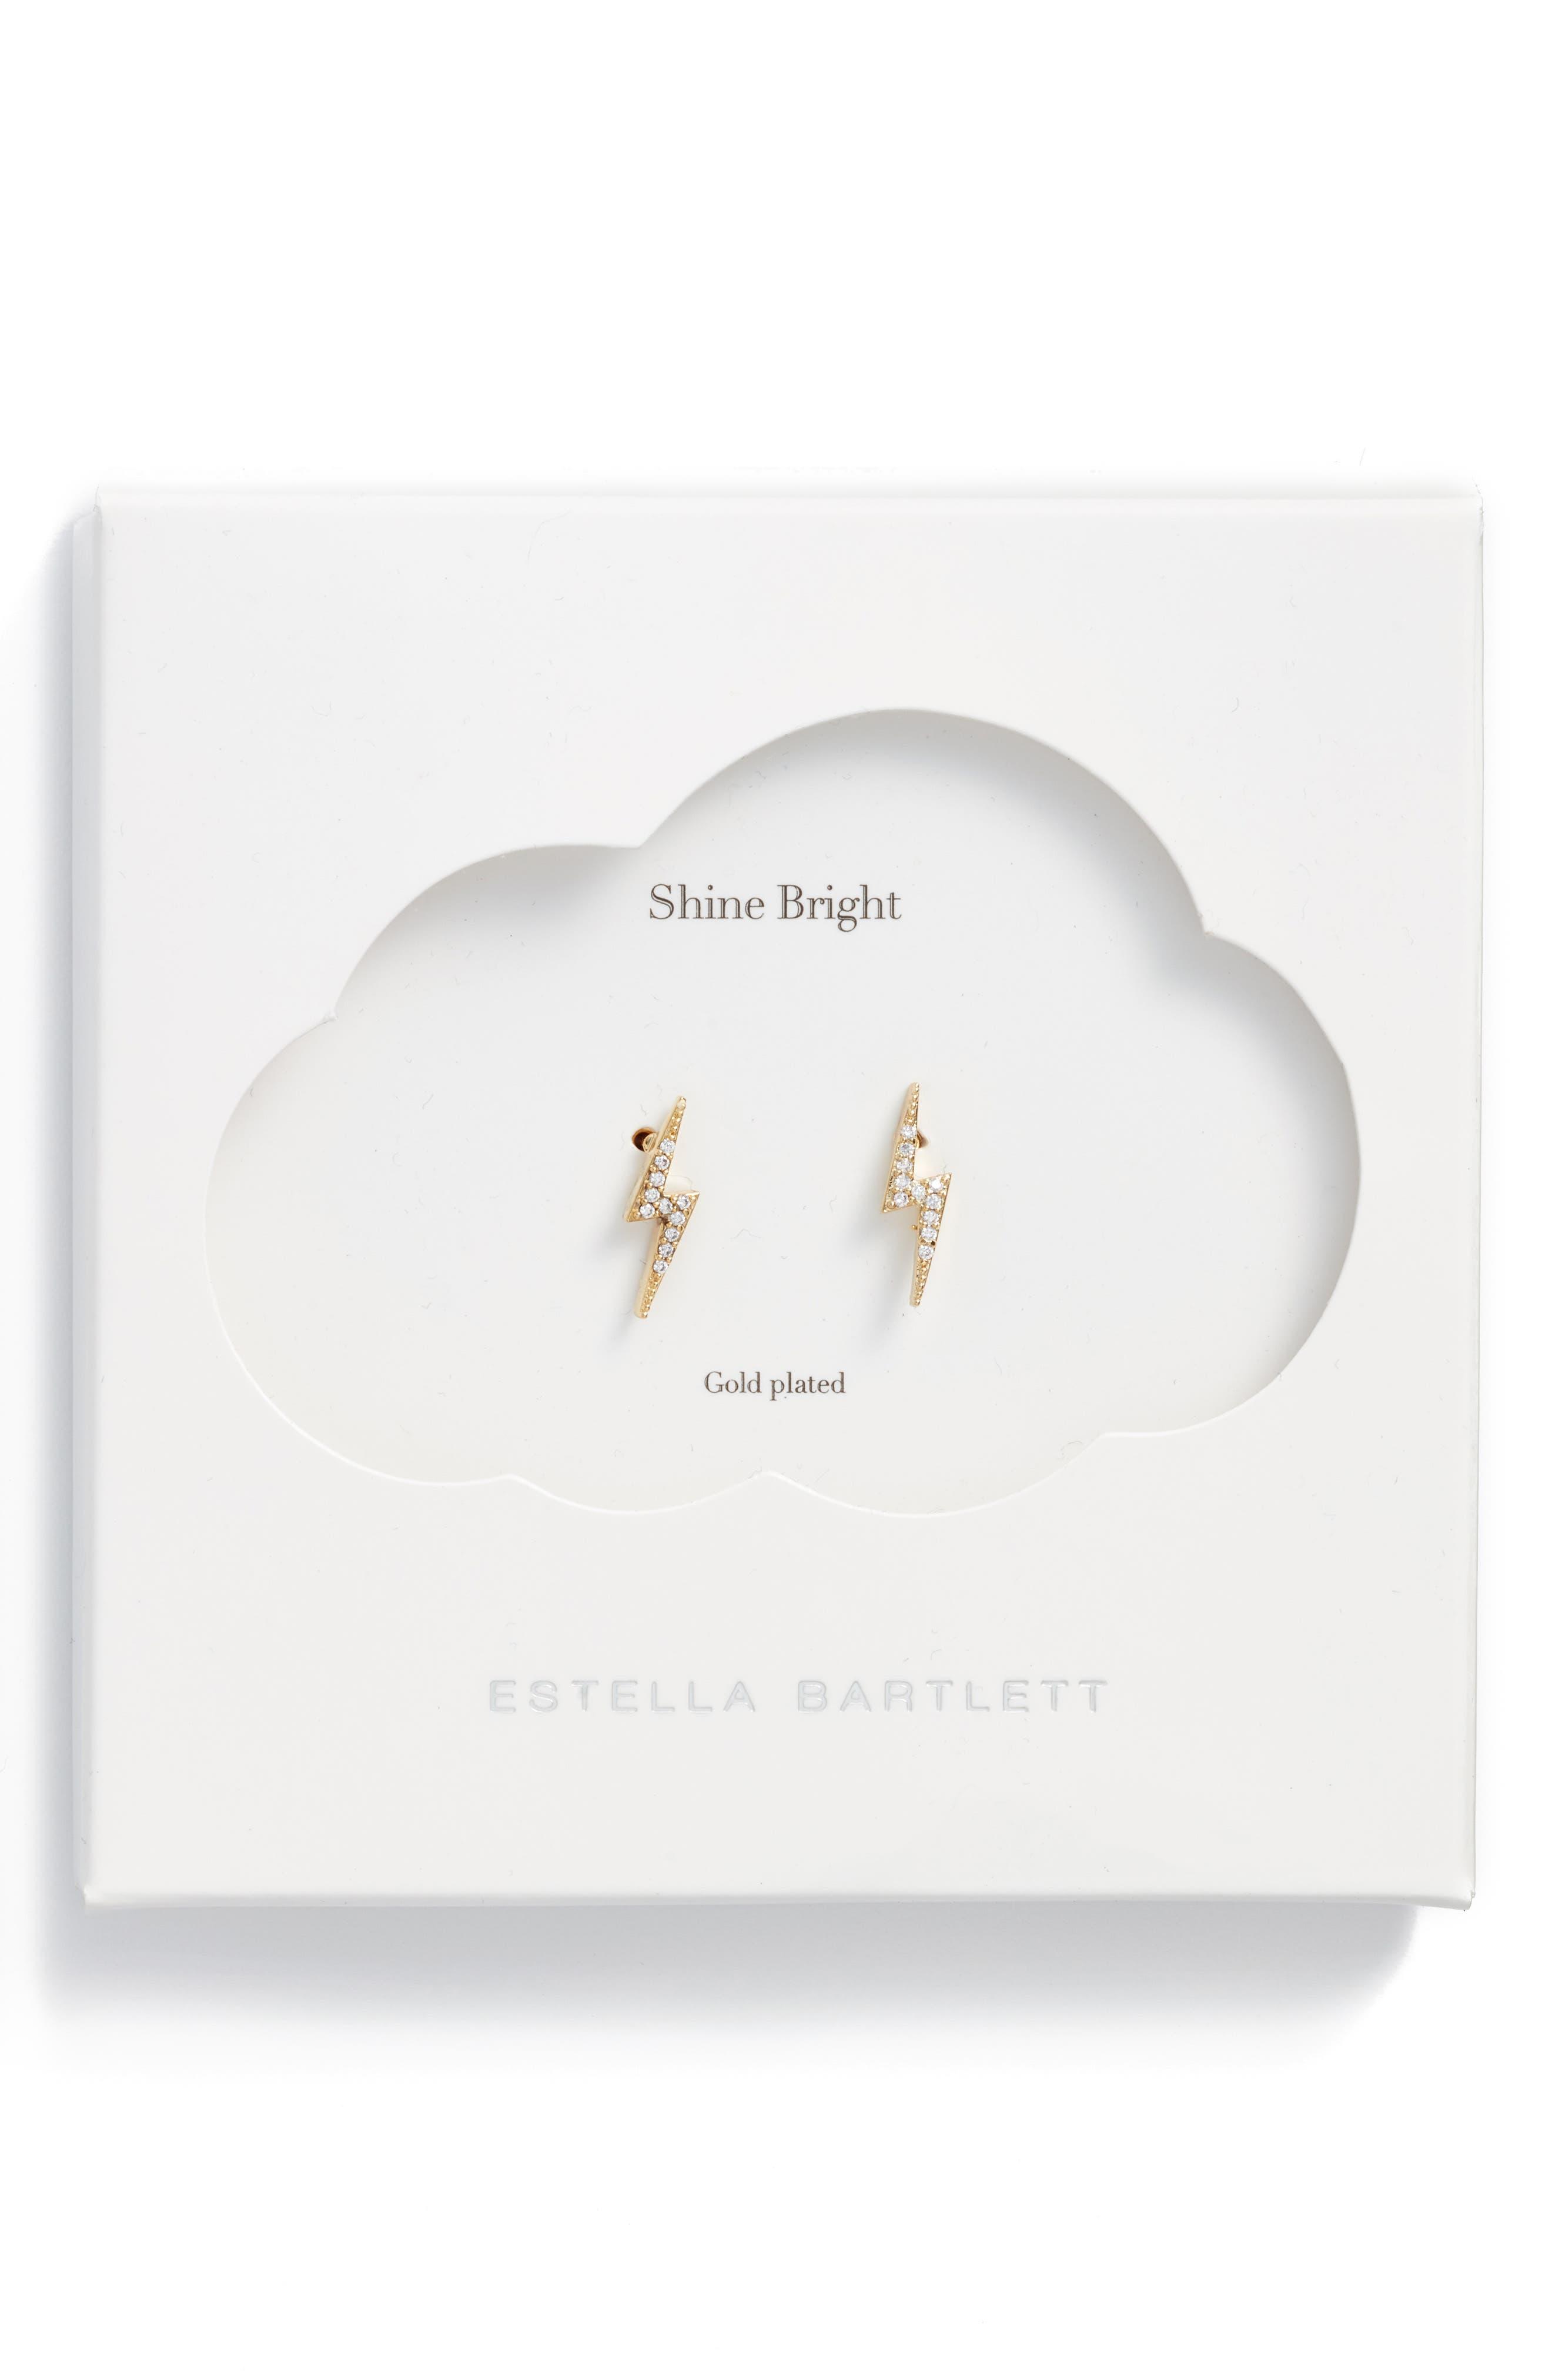 Crystal Lightning Bolt Stud Earrings,                             Main thumbnail 1, color,                             Gold